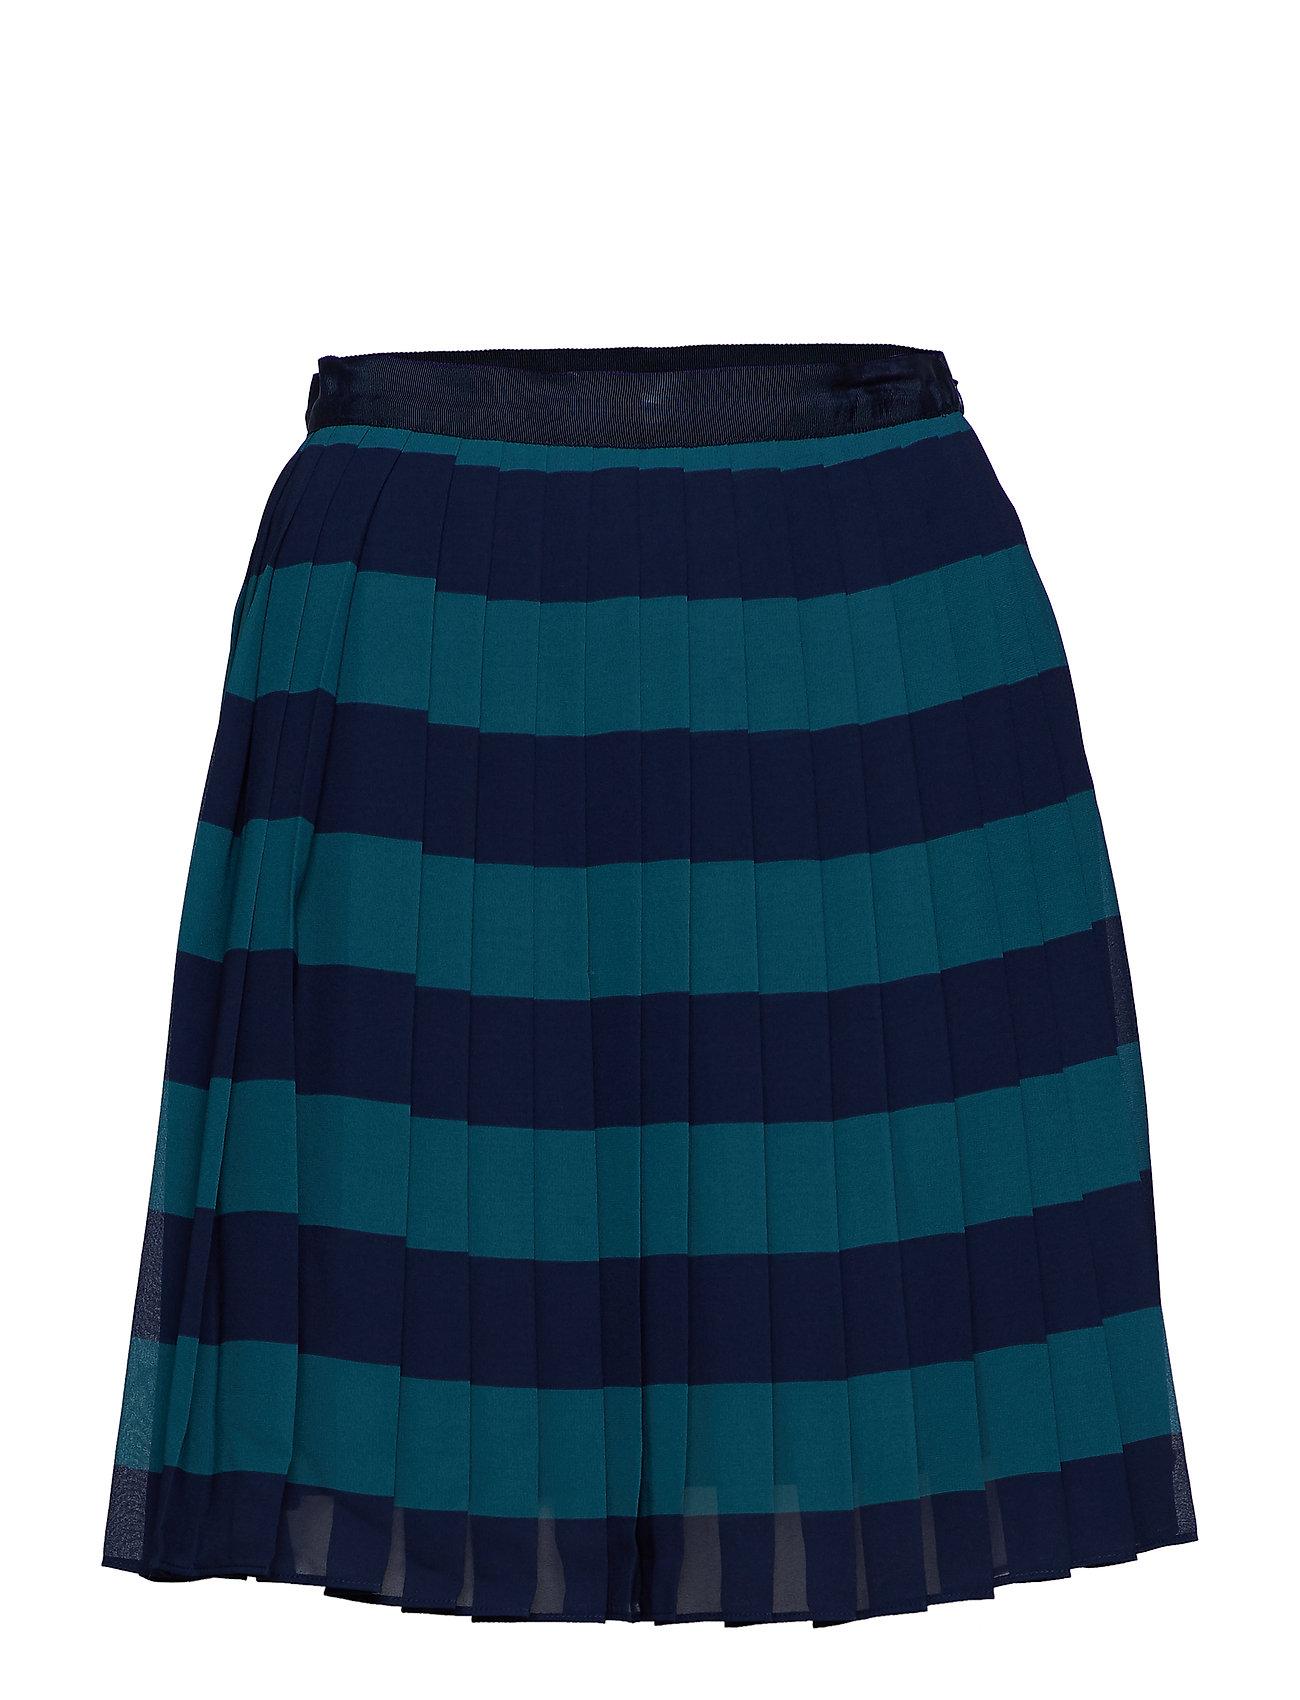 2850b0a5b7c3 JUNE BUG   SKY CAPTAIN STP Tommy Hilfiger Rose Pleated Mini Skirt ...